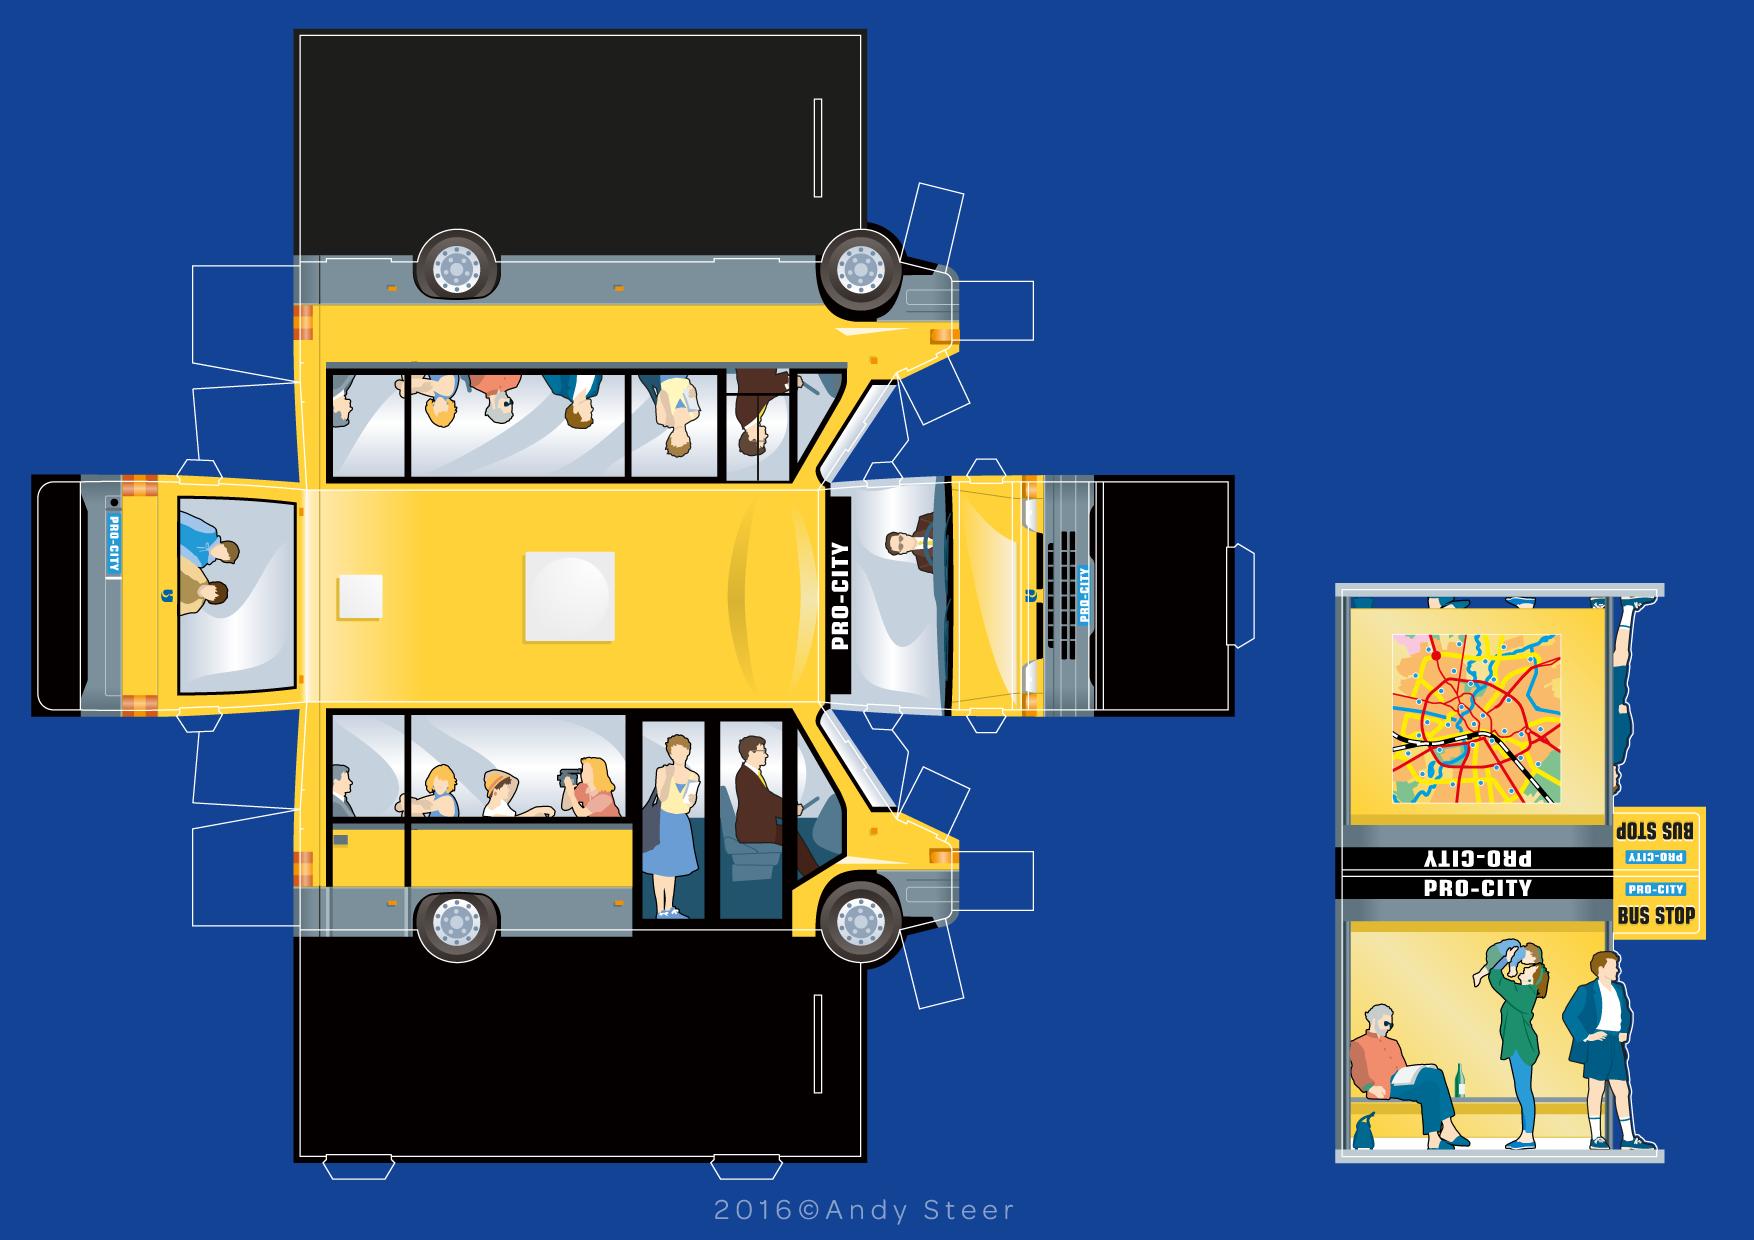 City Bus Cutaway Diagram - Bookmark About Wiring Diagram Niagara Wiring Schematics on